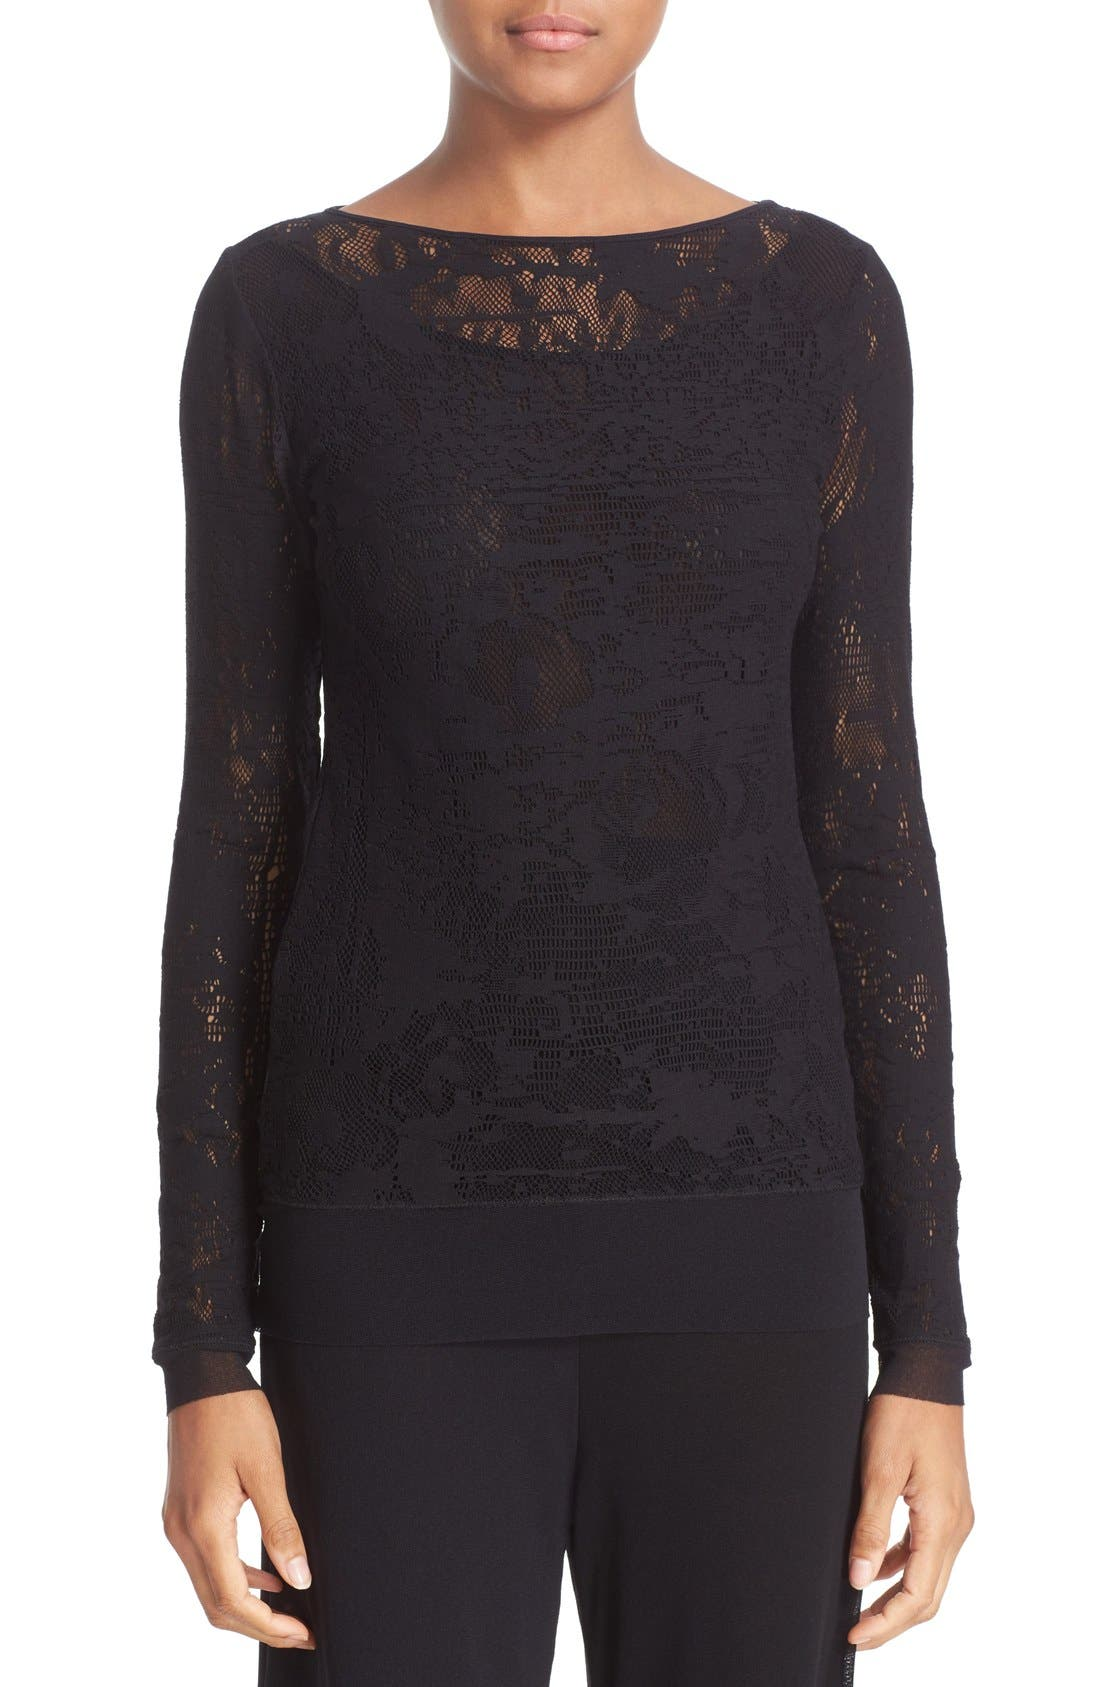 FUZZI Long Sleeve Lace Top